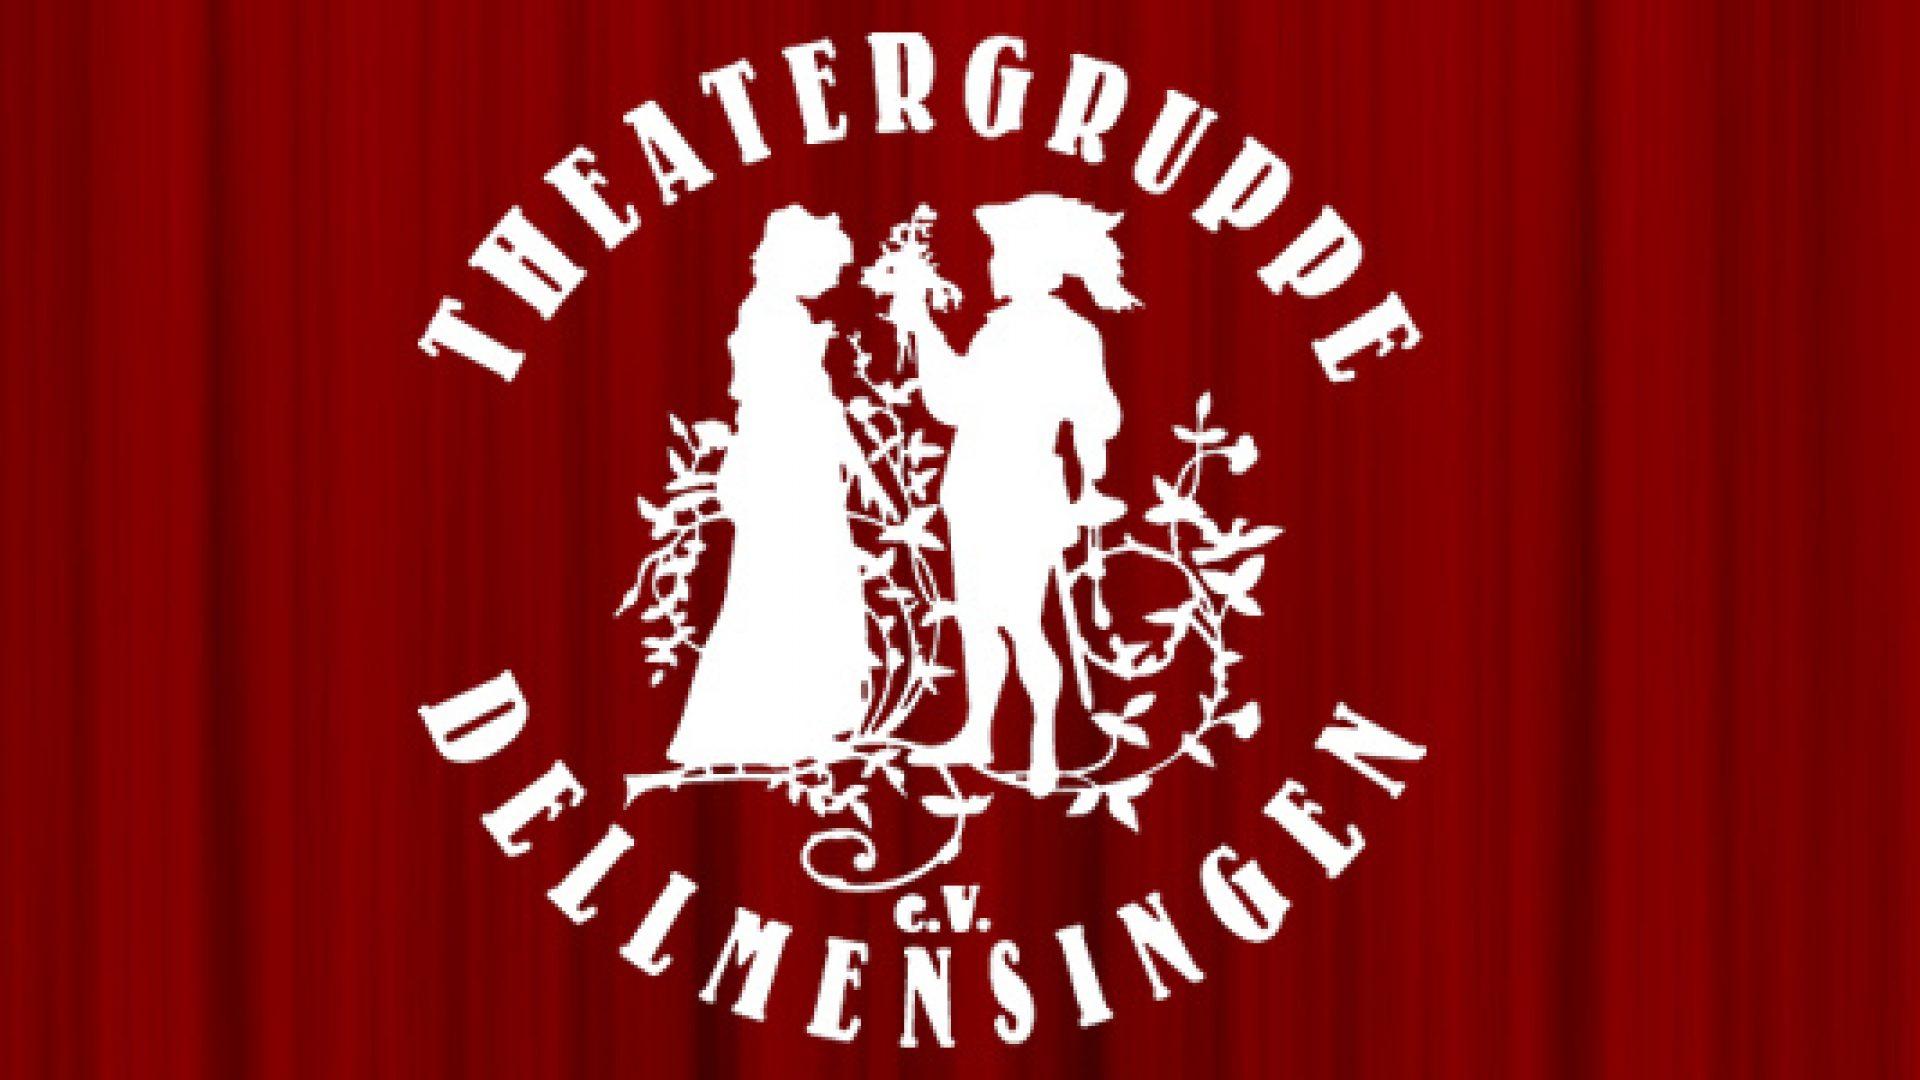 Theatergruppe Dellmensingen